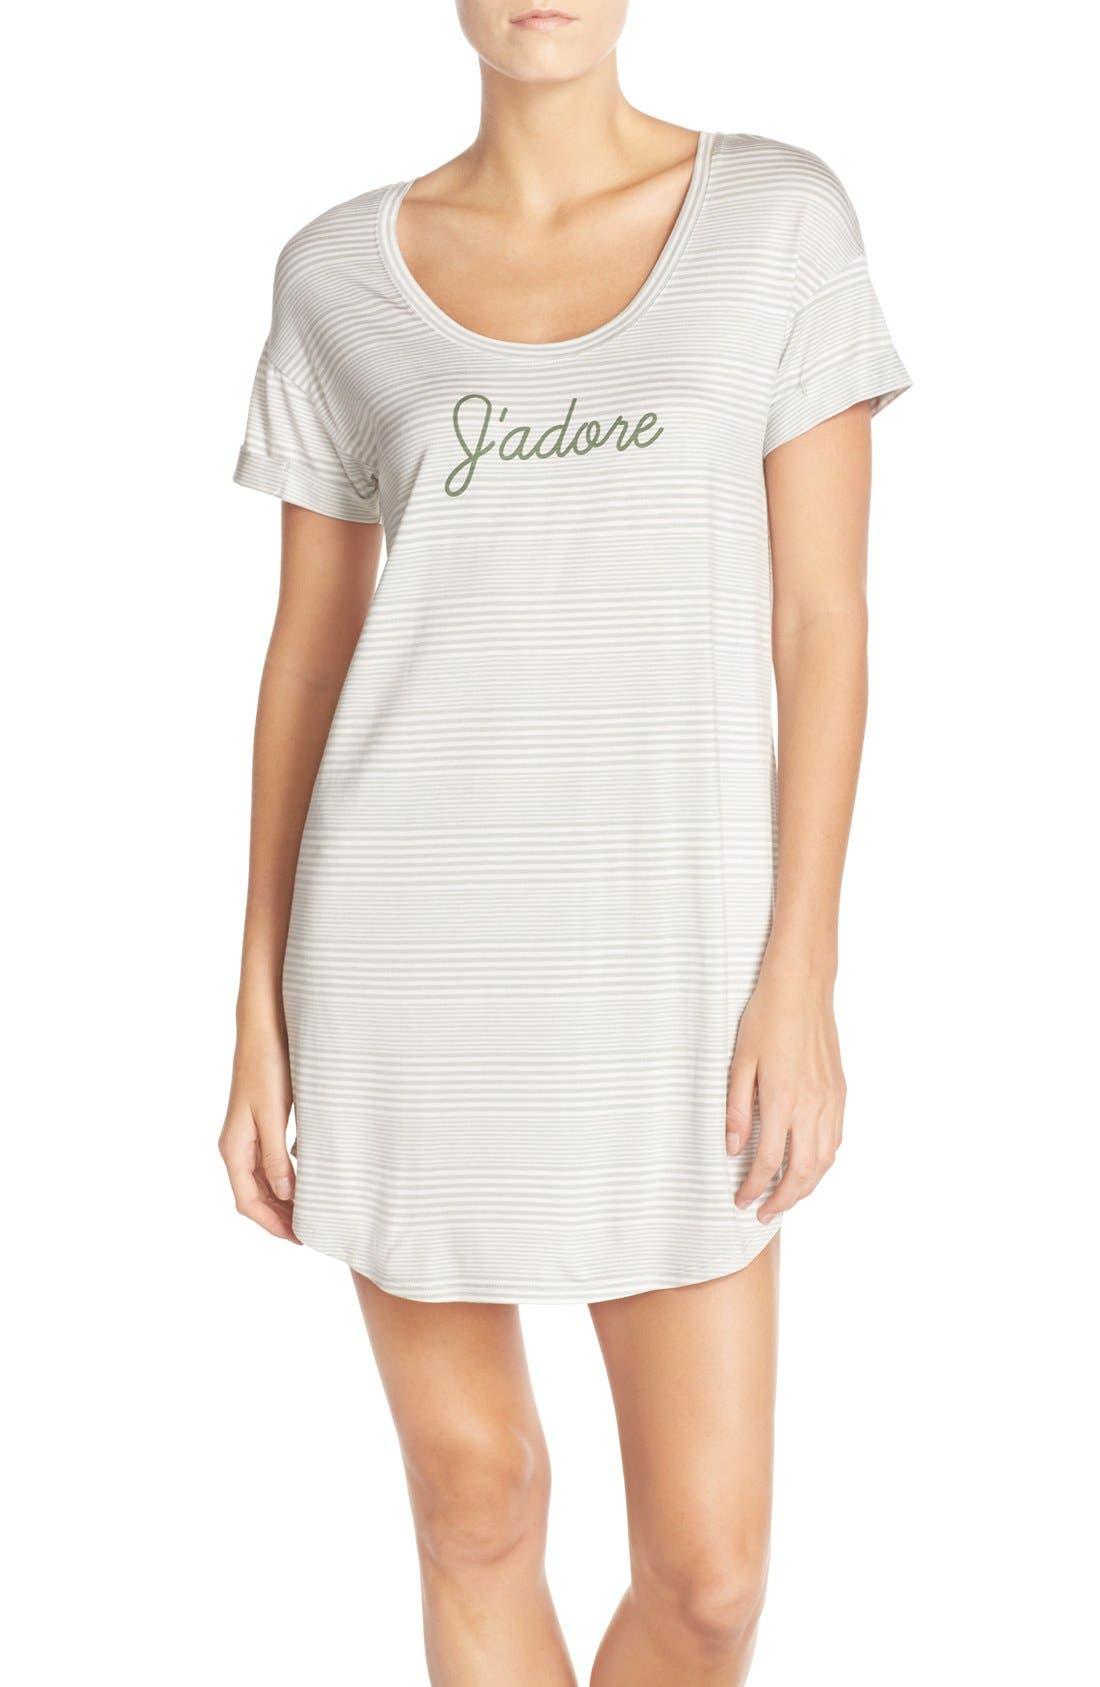 Main Image - Nordstrom Lingerie Graphic Jersey Sleep Shirt